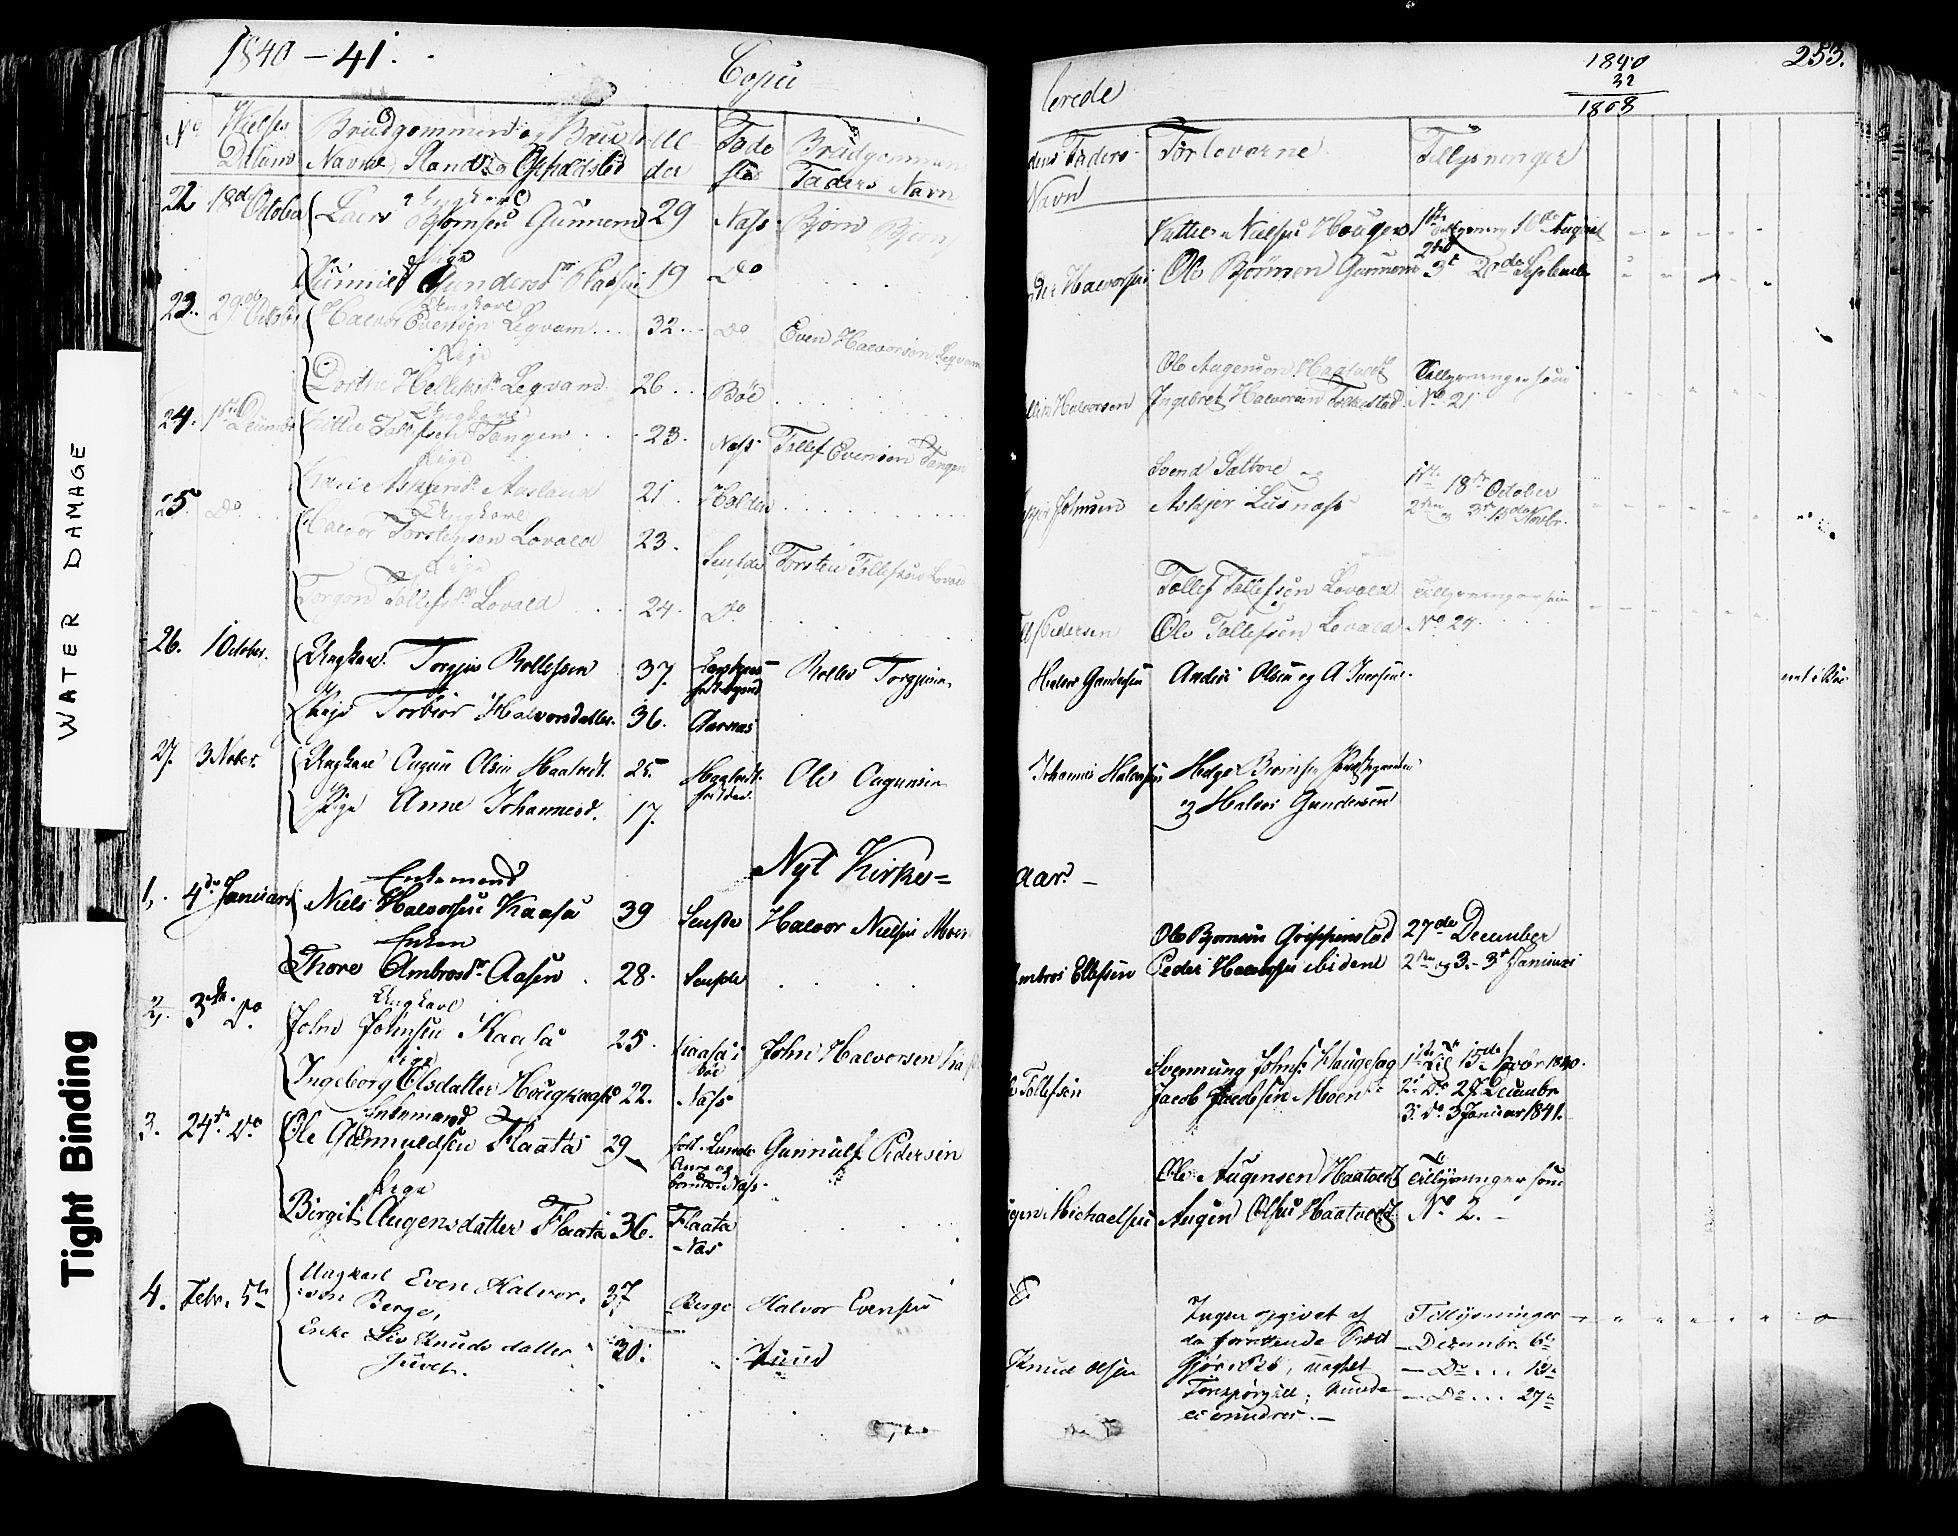 SAKO, Sauherad kirkebøker, F/Fa/L0006: Ministerialbok nr. I 6, 1827-1850, s. 253